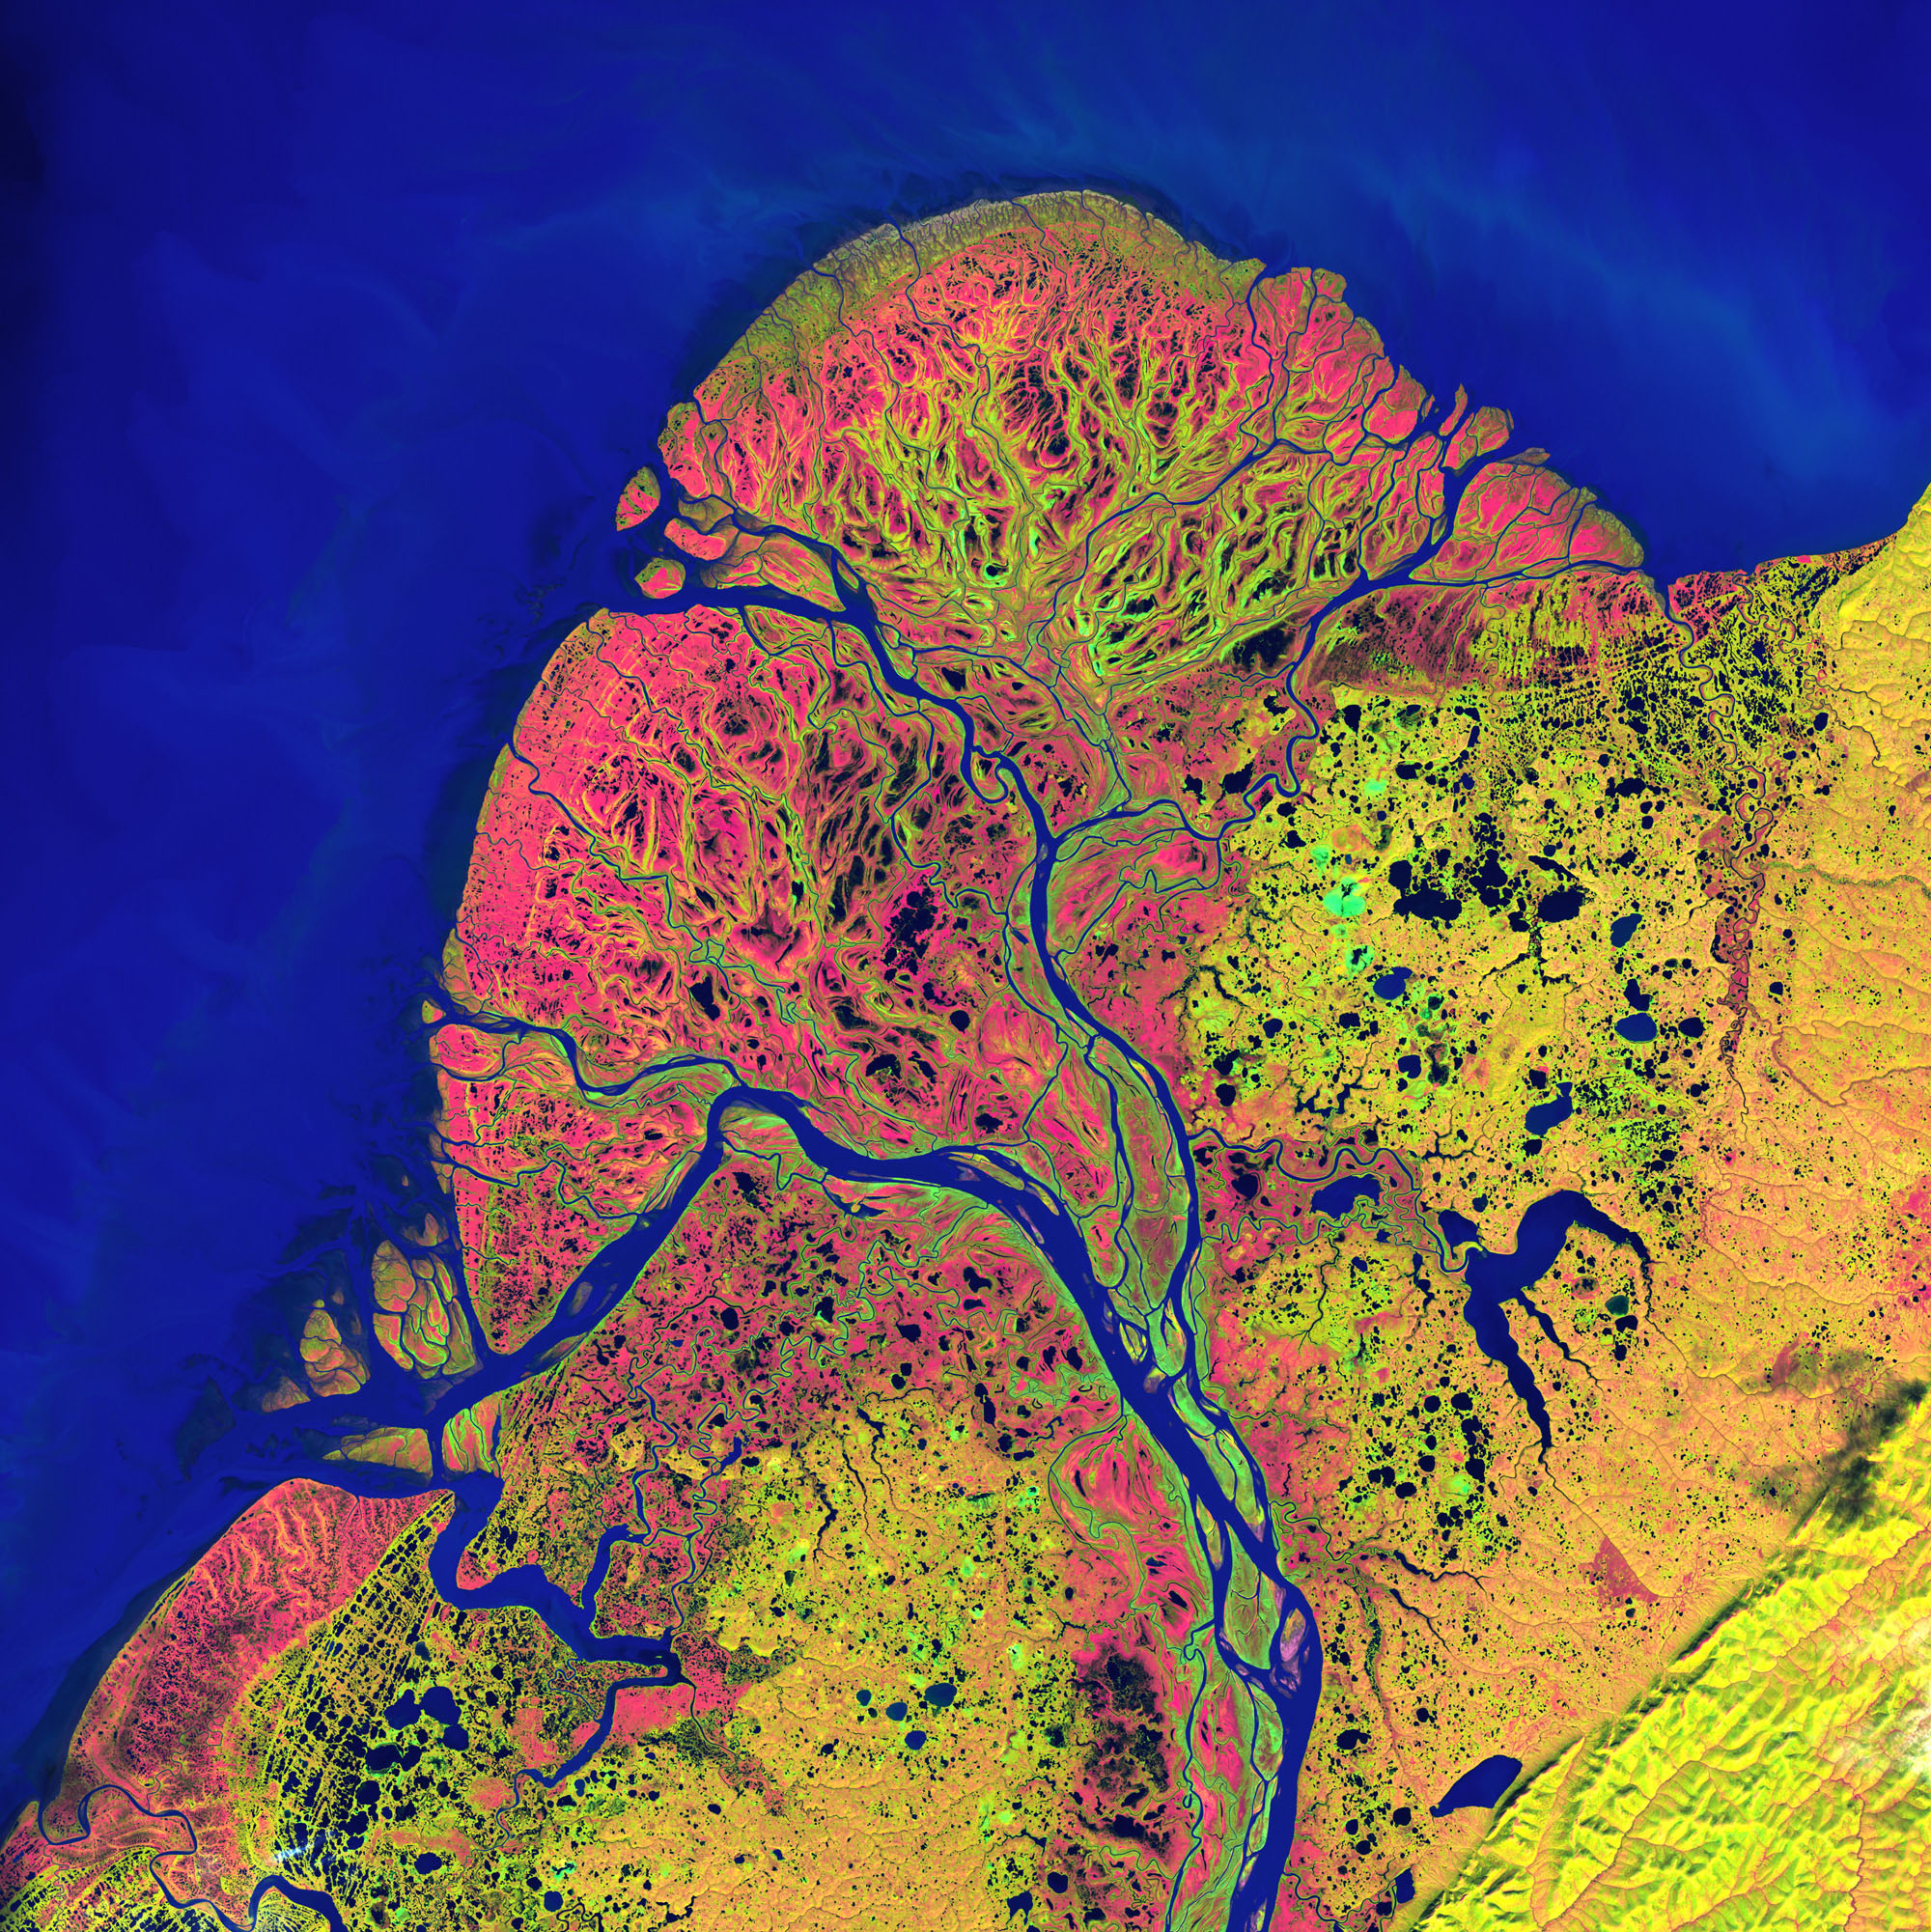 Earth from Space: Yukon Delta by NASA